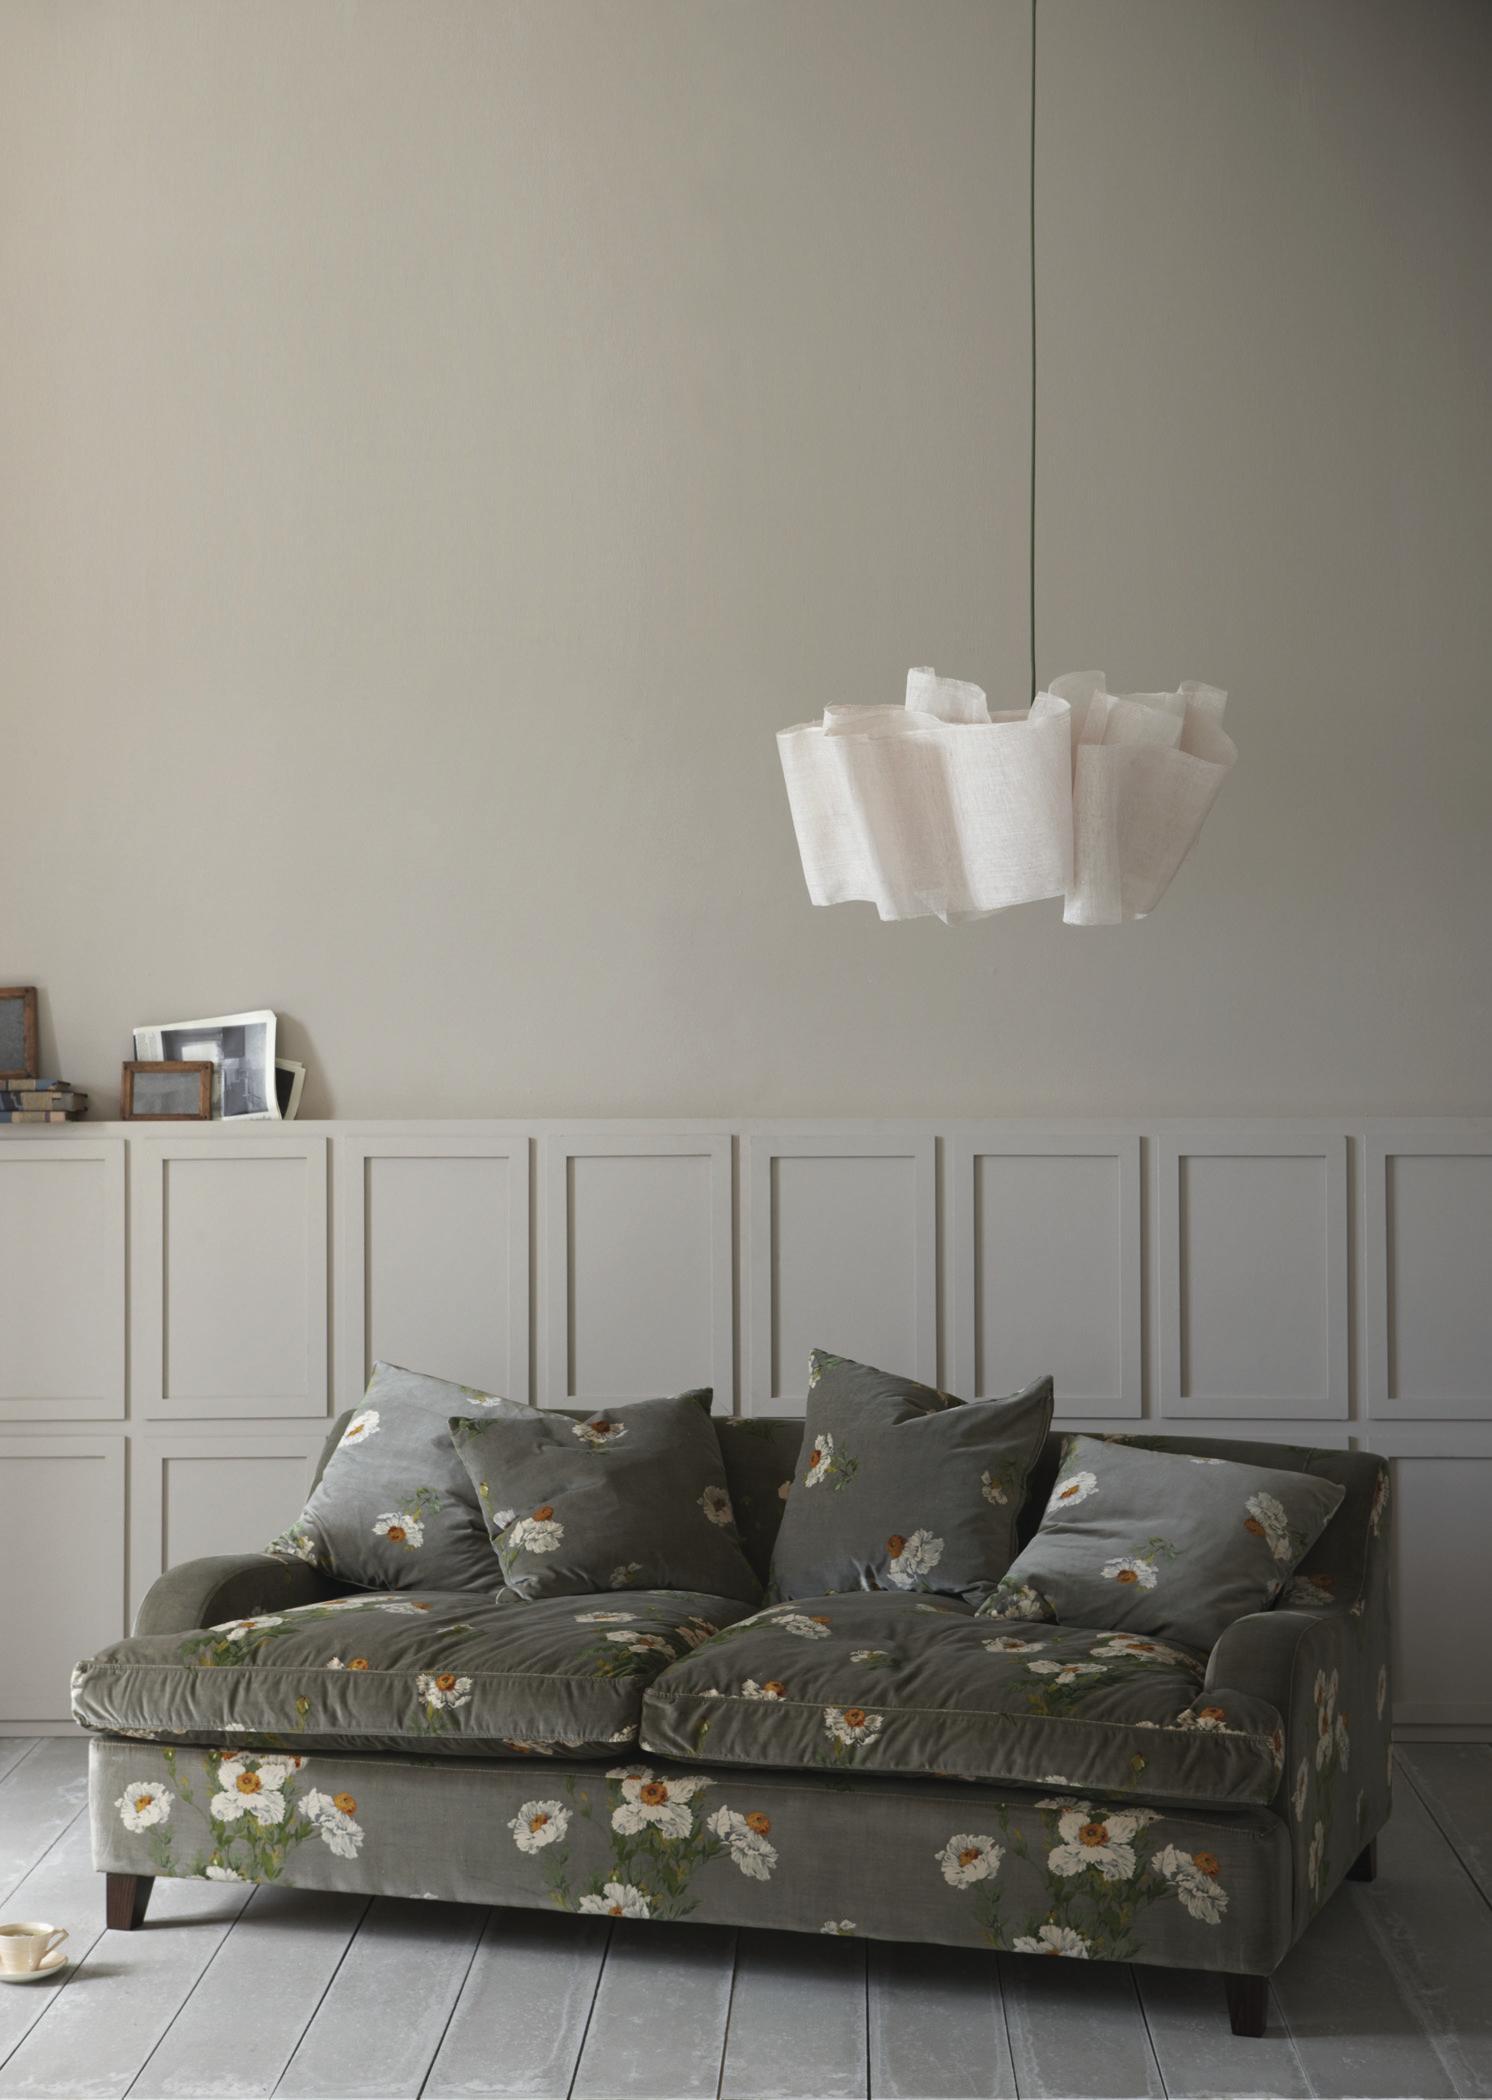 design katzenm bel bilder ideen couch. Black Bedroom Furniture Sets. Home Design Ideas